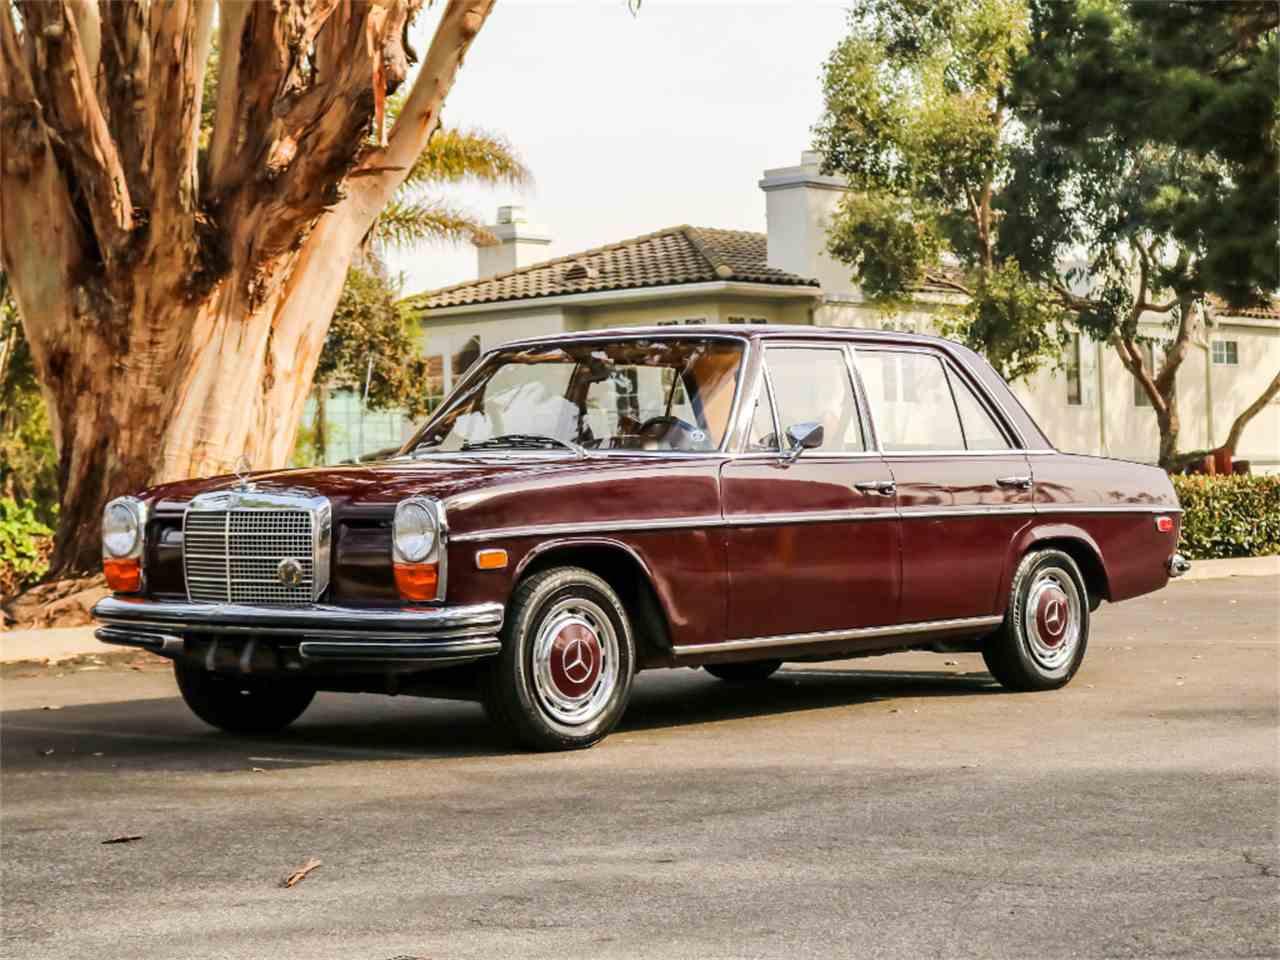 1968 Mercedes-Benz 250 for Sale | ClassicCars.com | CC-1061173